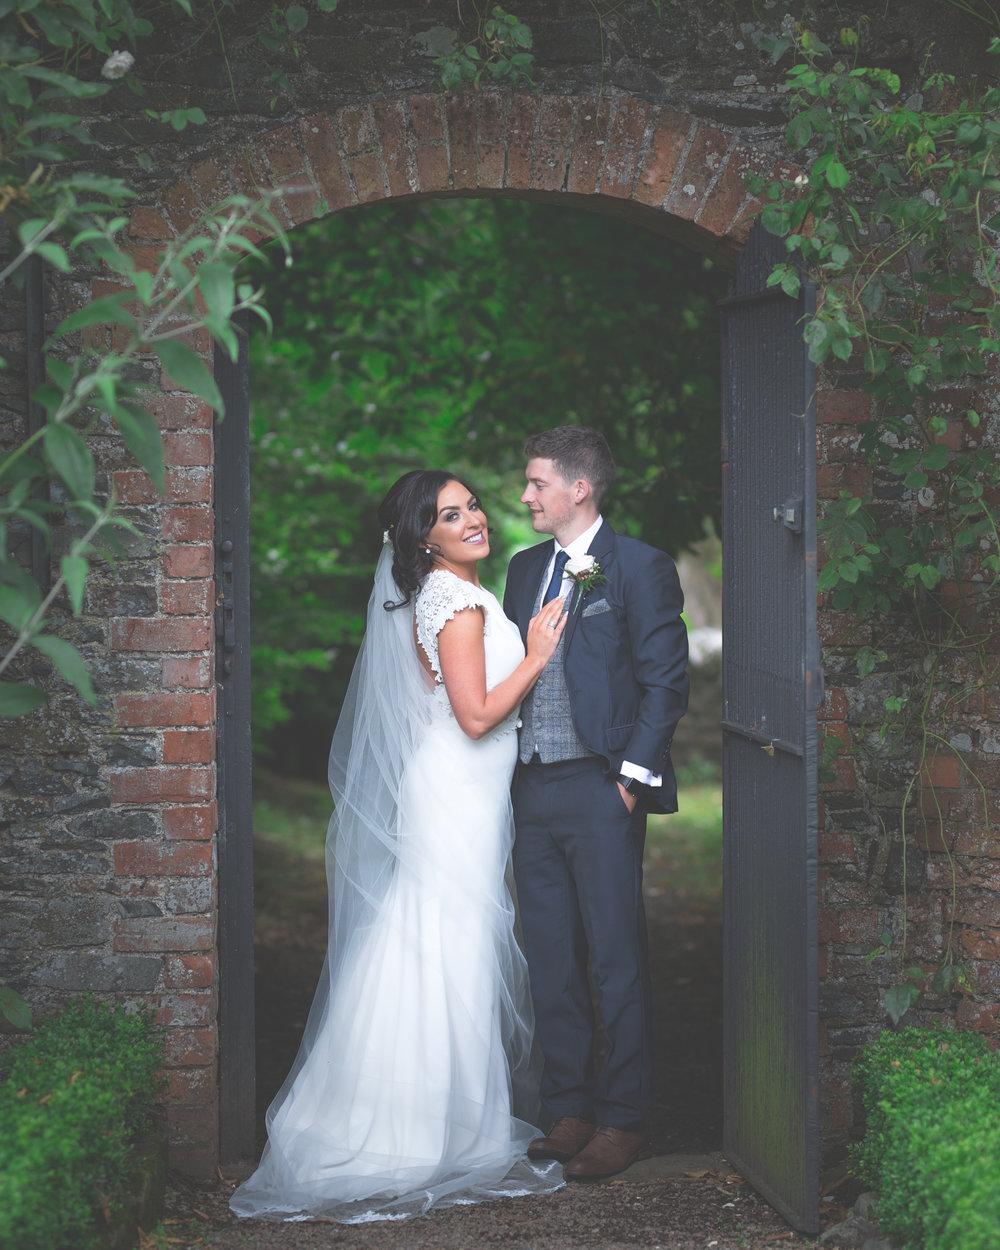 Brian McEwan Wedding Photography | Carol-Anne & Sean | The Portraits-48.jpg